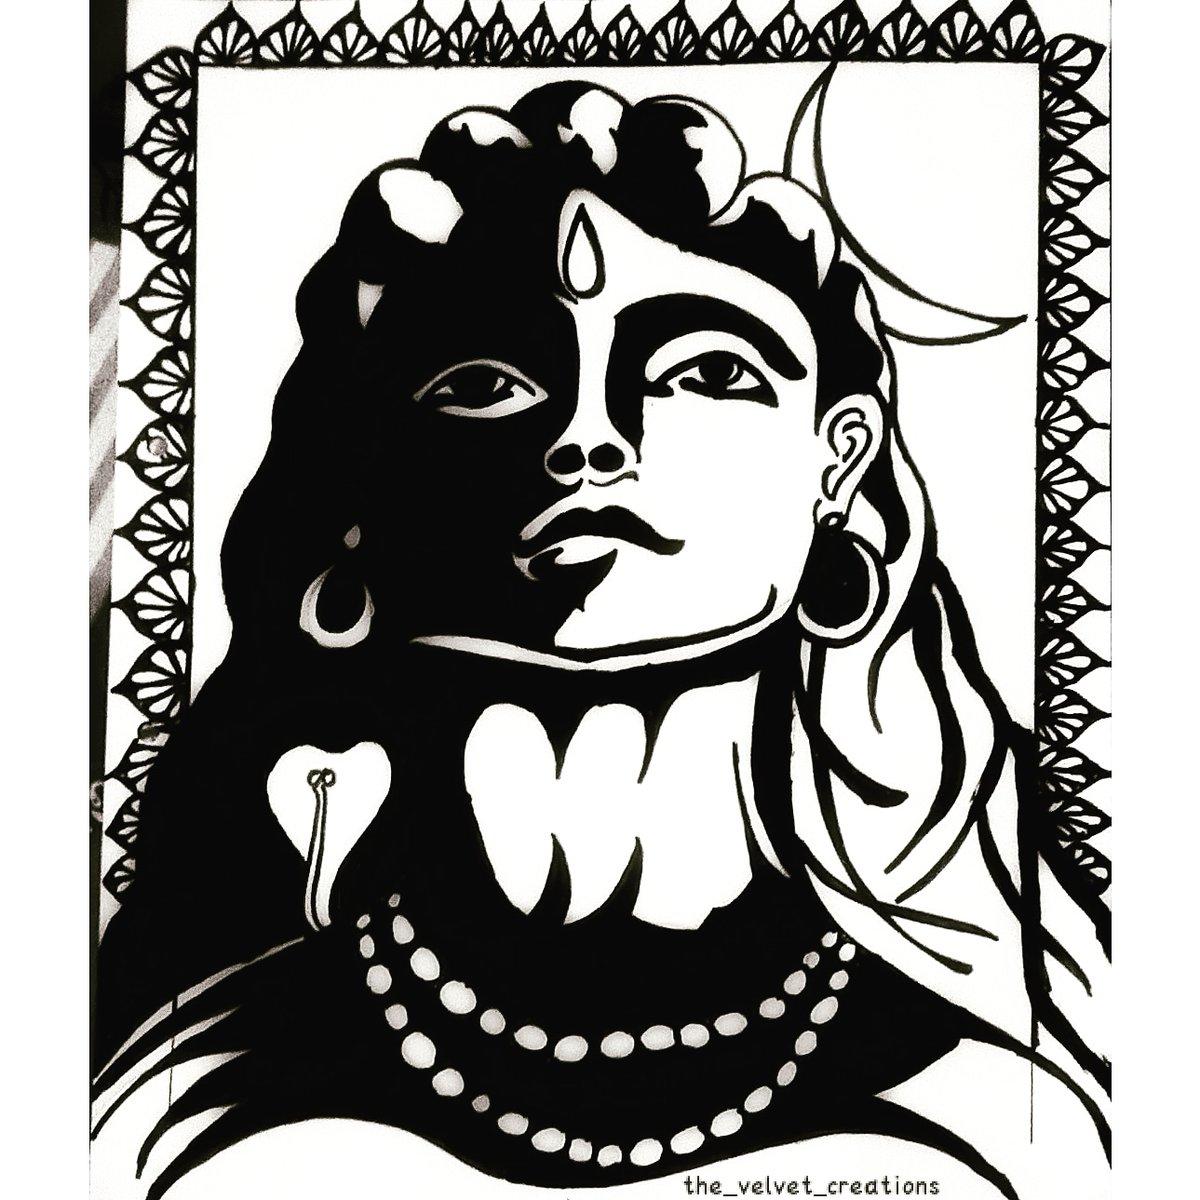 ओम तत्पुरुषाय विद्महे महादेवाय धीमहि तन्नो रुद्र: प्रचोदयात।.. ... ... #art #artist #artlife #artistfangallery #artsy #artlife #mahadev #adiyogishiva #spirituality #dharma #sketch_daily #sketchoftheday #sketches #pencilartwork #pencilart #artsupporters #artoftheday #shiva #shanti